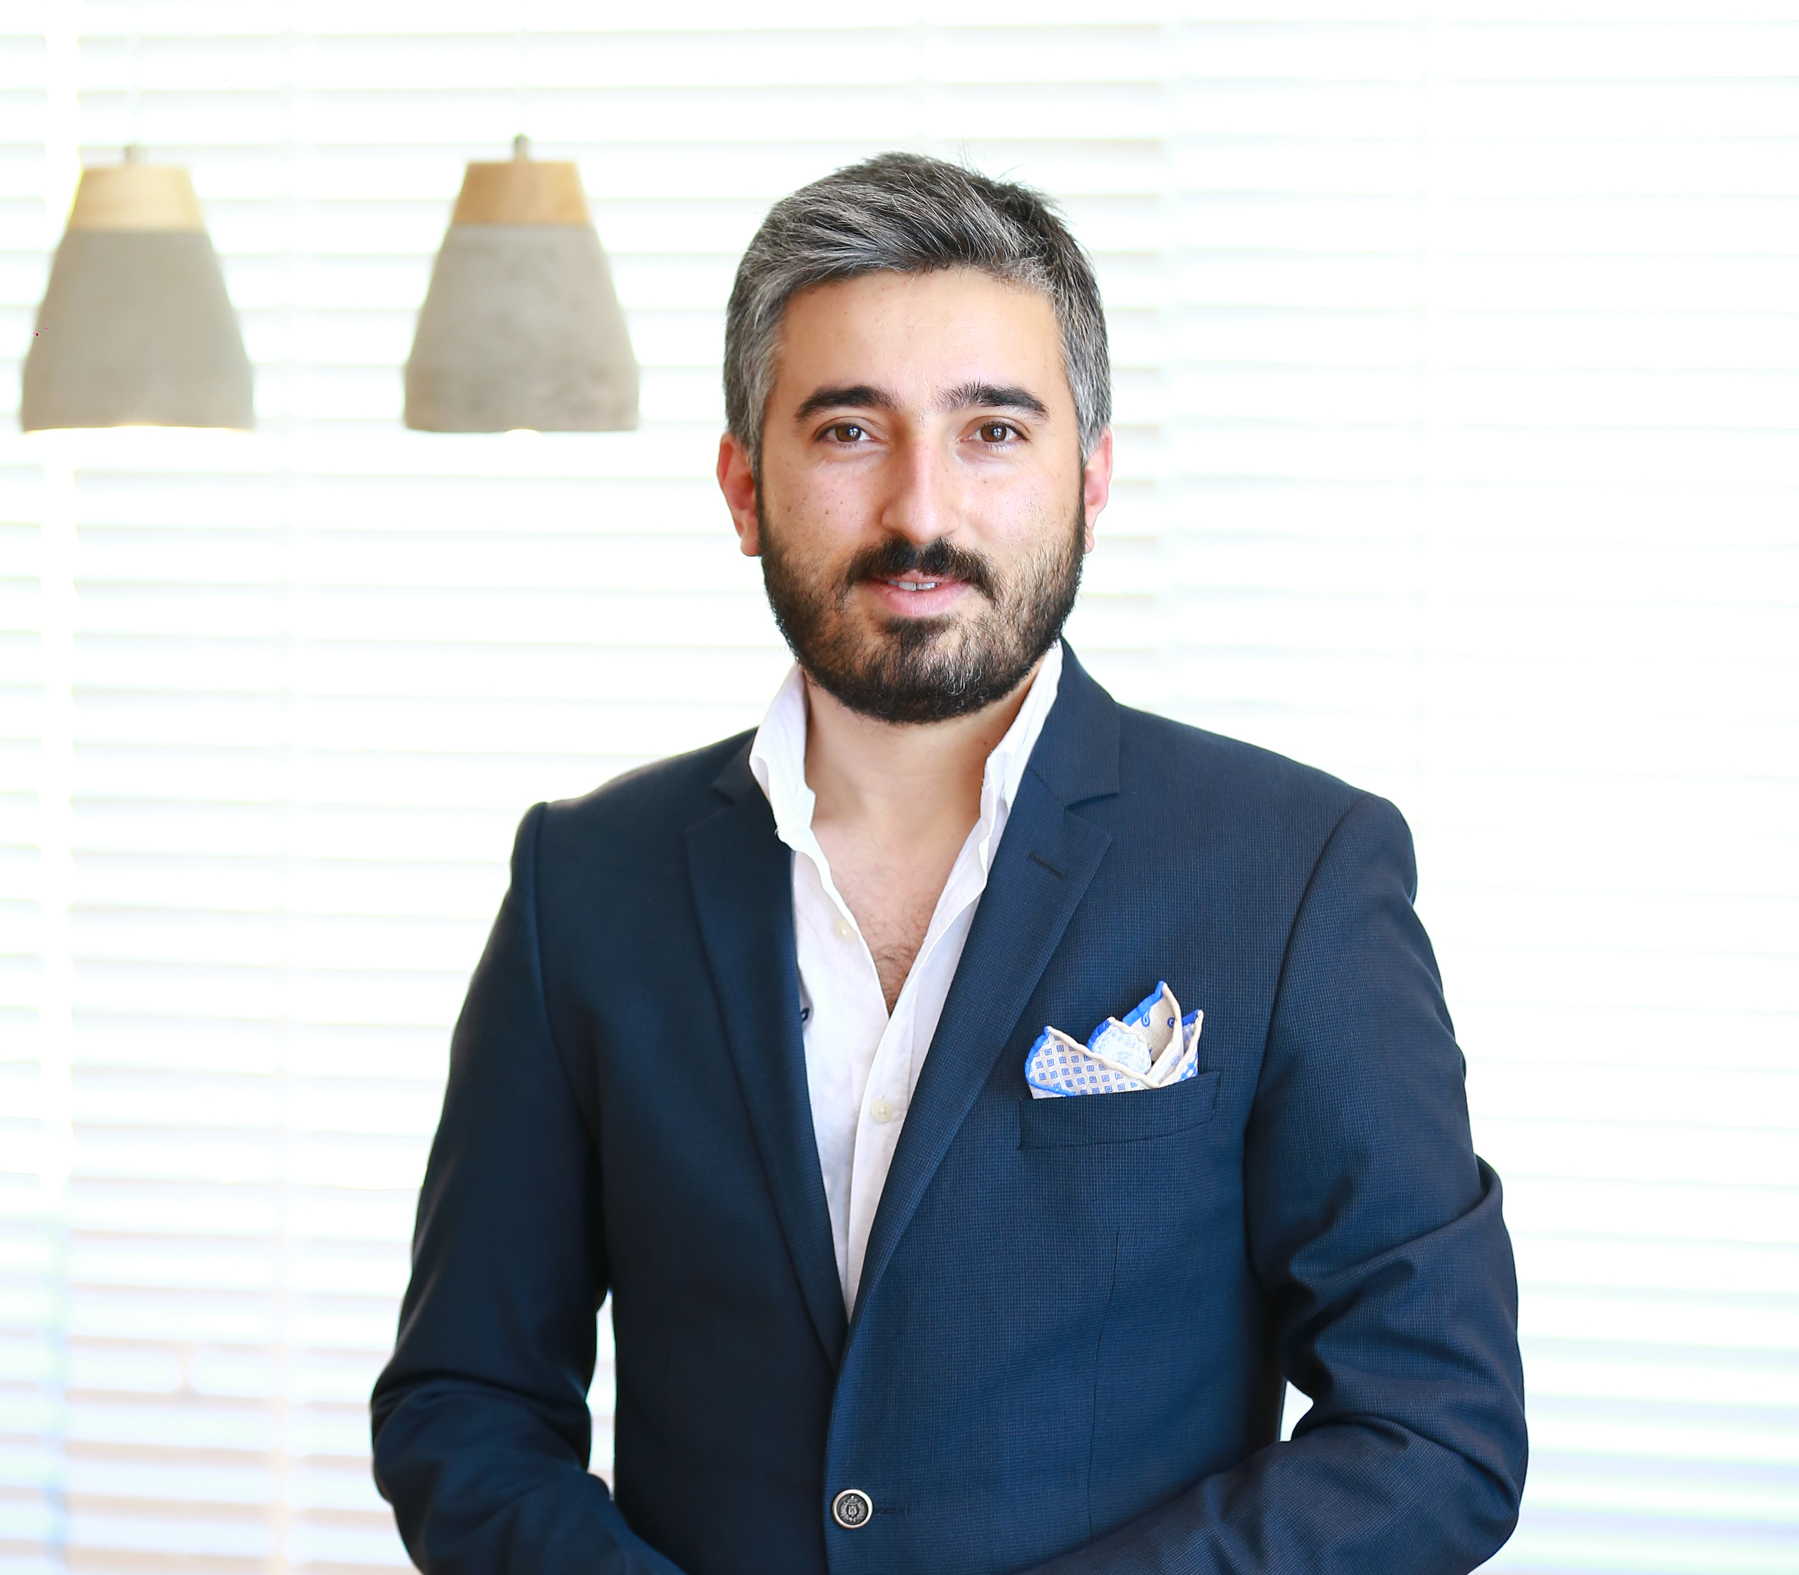 http://www.serkanbariskan.com/wp-content/uploads/2015/11/en-iyi-burun-estetigi-doktoru.jpg